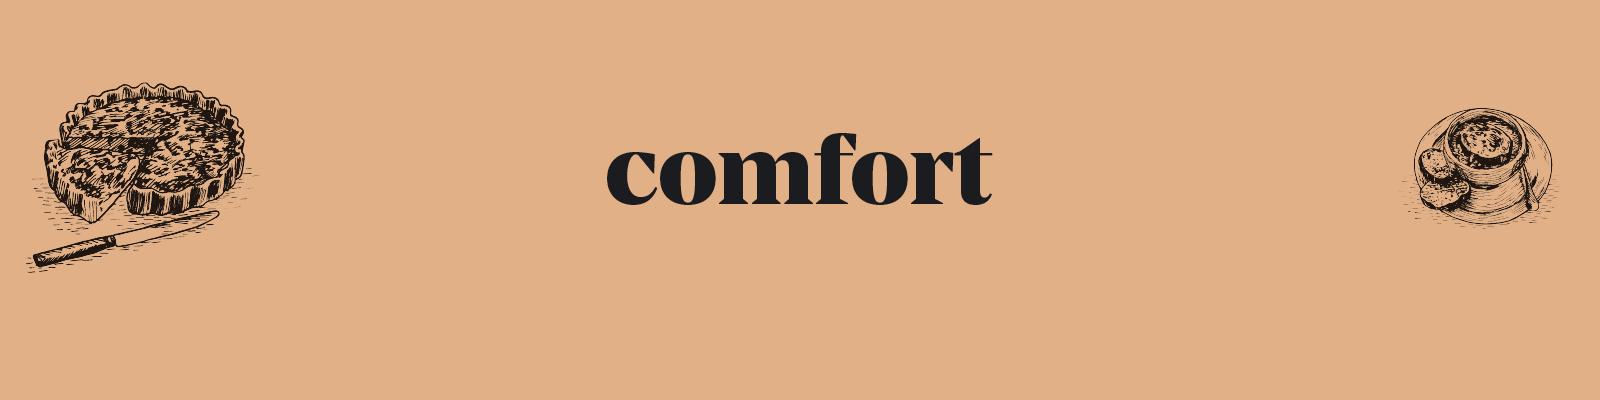 CoverPhotosRVSD_Comfort1600x400.jpg